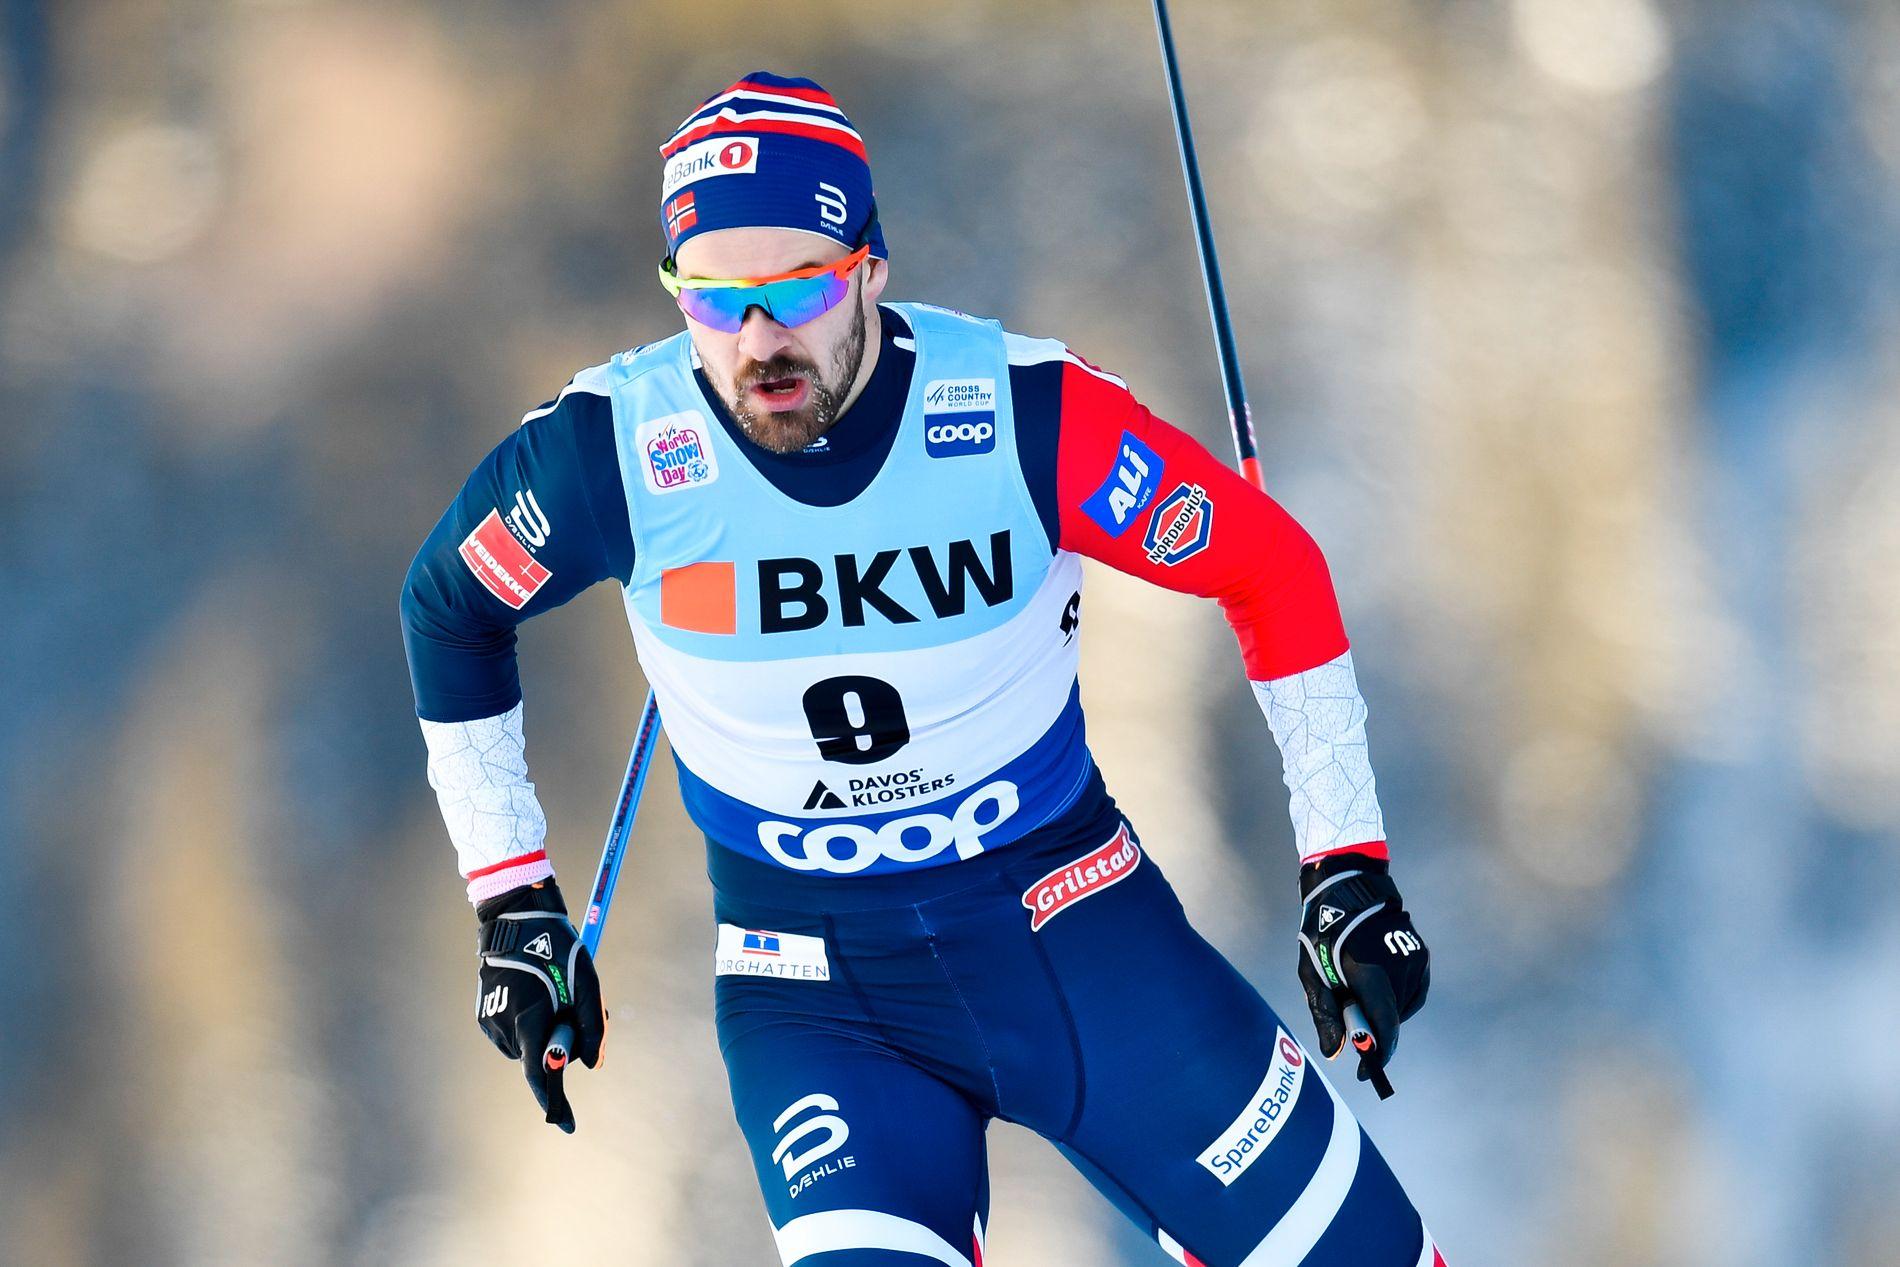 LANDSLAGSLØPER: Sondre Turvoll Fossli under verdenscupen i Davos 15. desember i fjor.